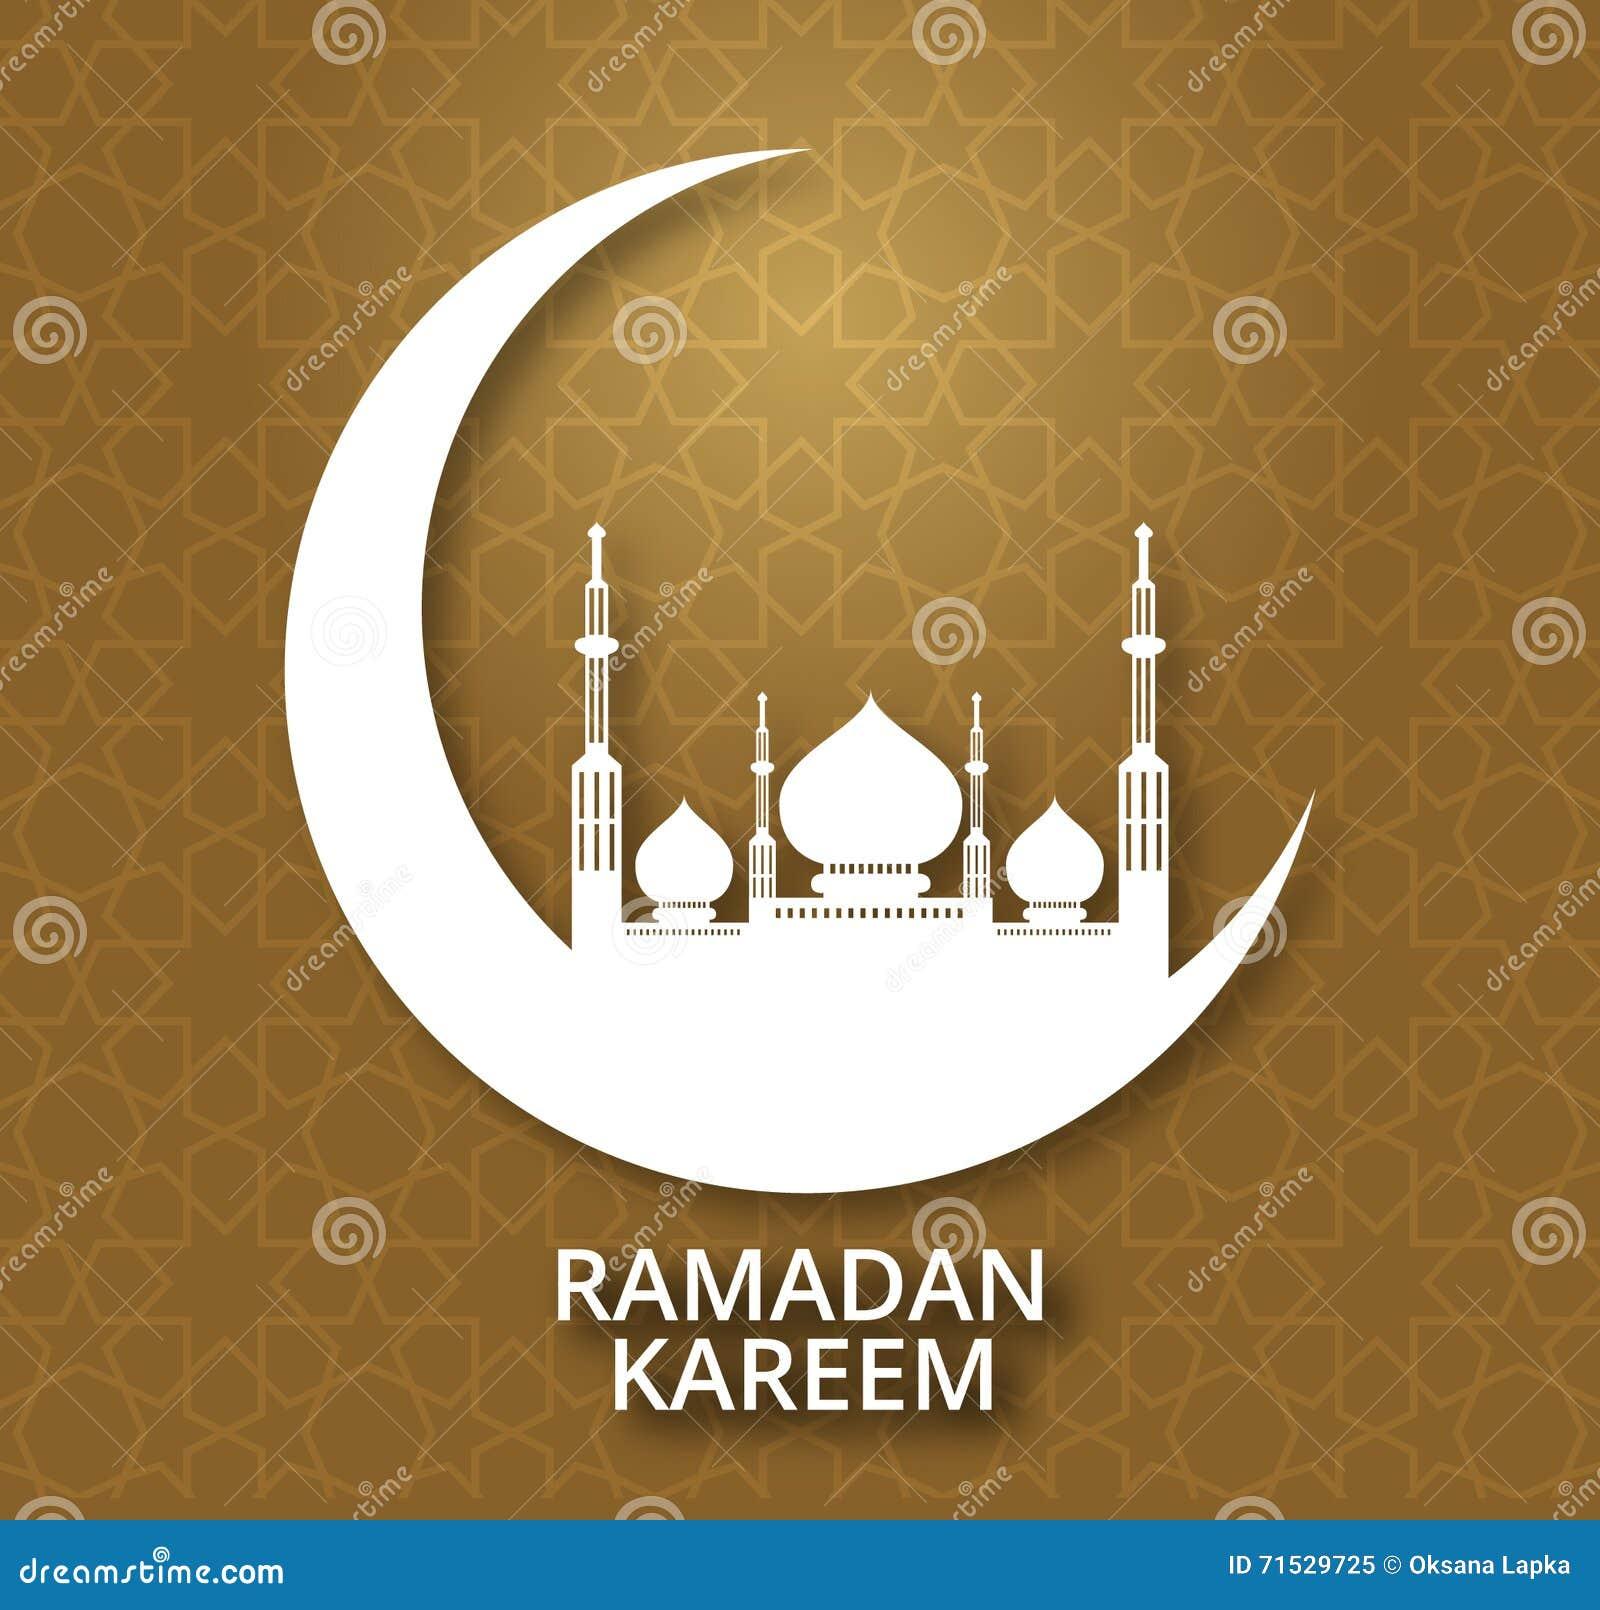 Mosque background for ramadan kareem stock photography image - Royalty Free Stock Photo Arabic Background Beautiful Card Greeting Holy Islamic Kareem Month Mosque Muslim Pattern Ramadan